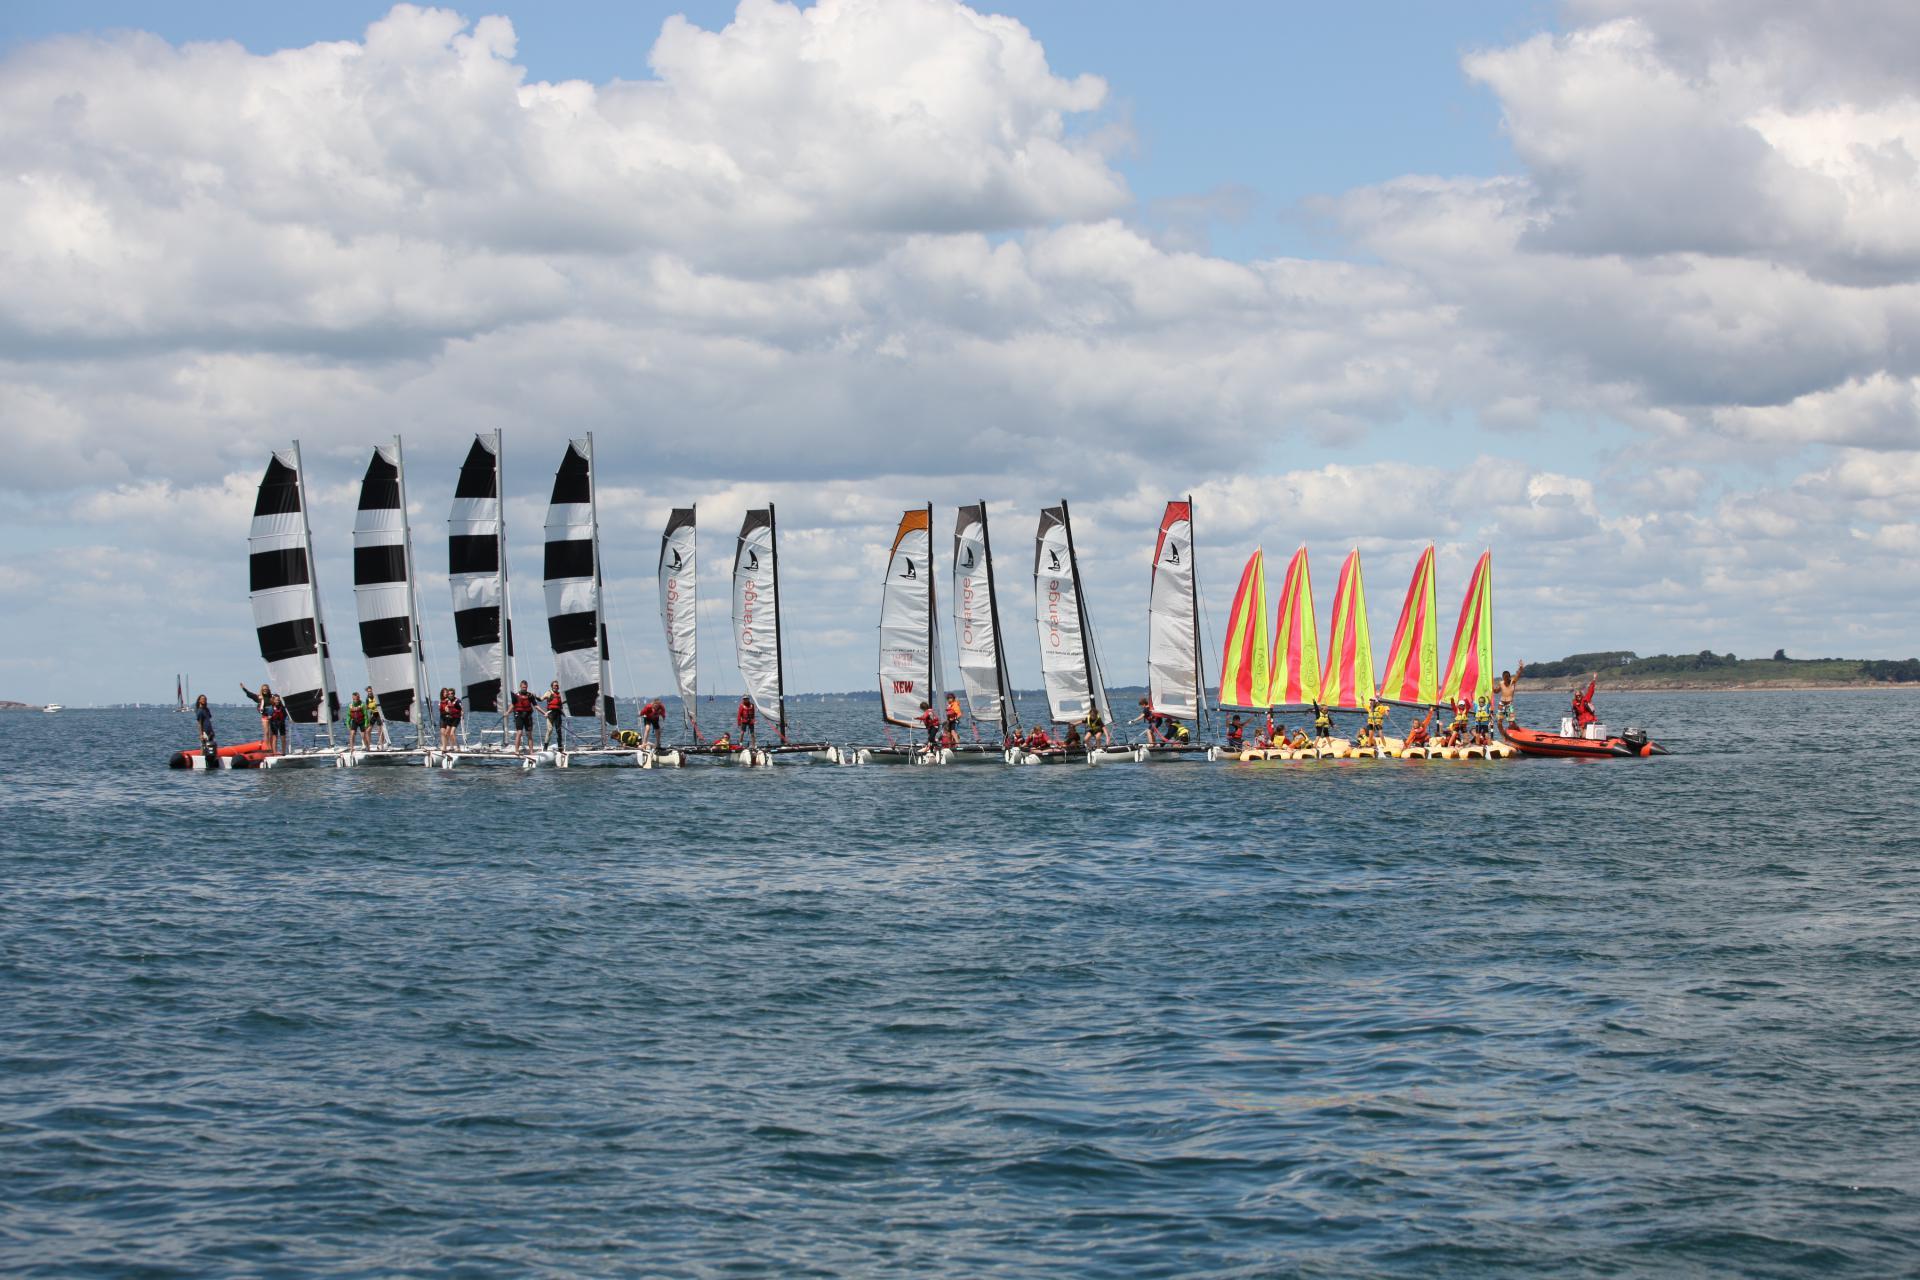 Club Nautique du Rohu - Joli radeau qui réuni les trois flottes (Dart 16, Minicata et Funbaot)